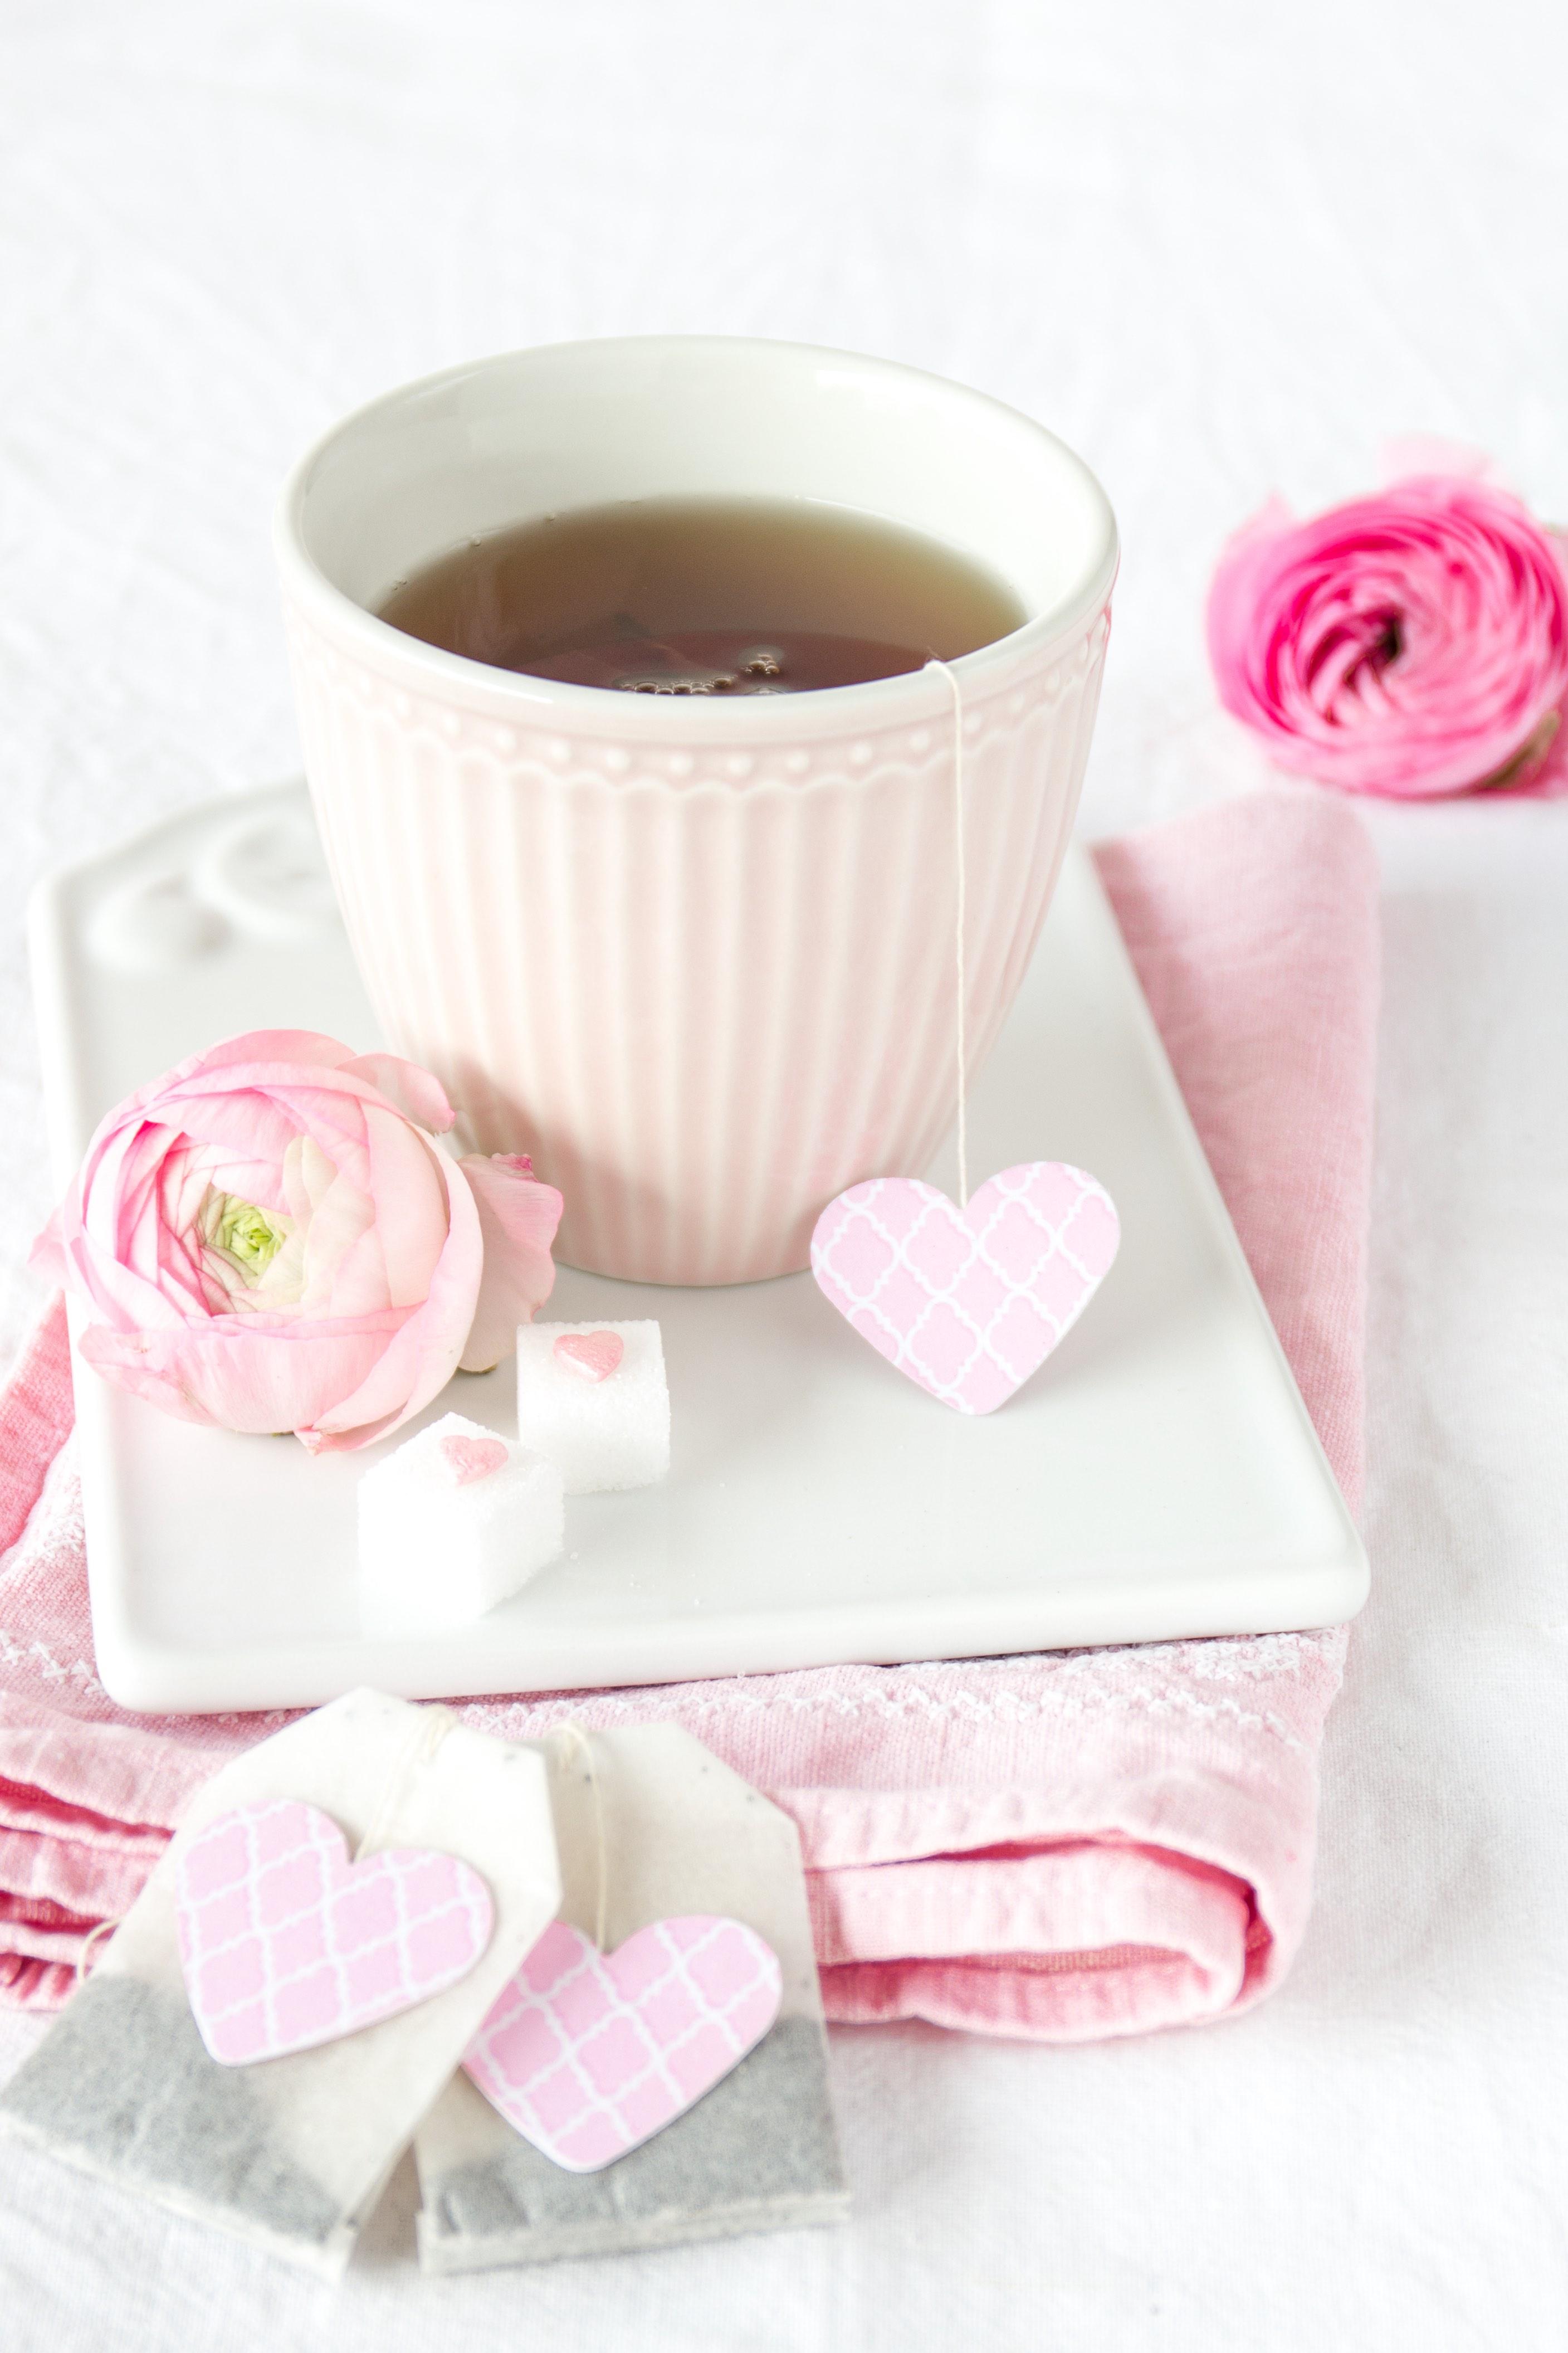 DIY Valentinstag: Teebeutel Herz Anhänger selber machen #diy #valentinstag #selbermachen #herz #teebeutel | Emma´s Lieblingsstücke